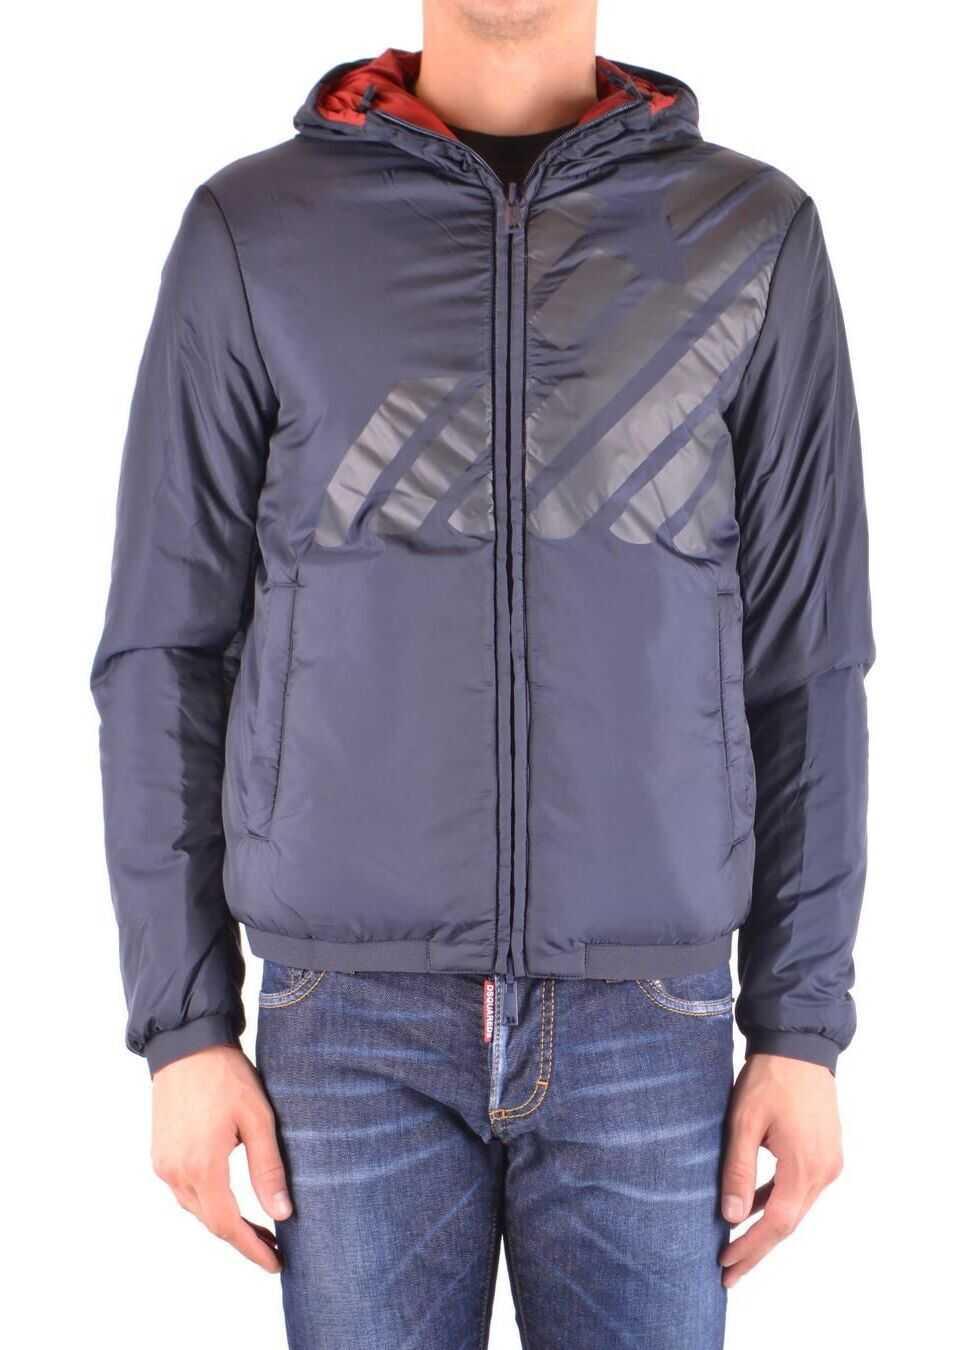 Emporio Armani Polyester Outerwear Jacket BLUE